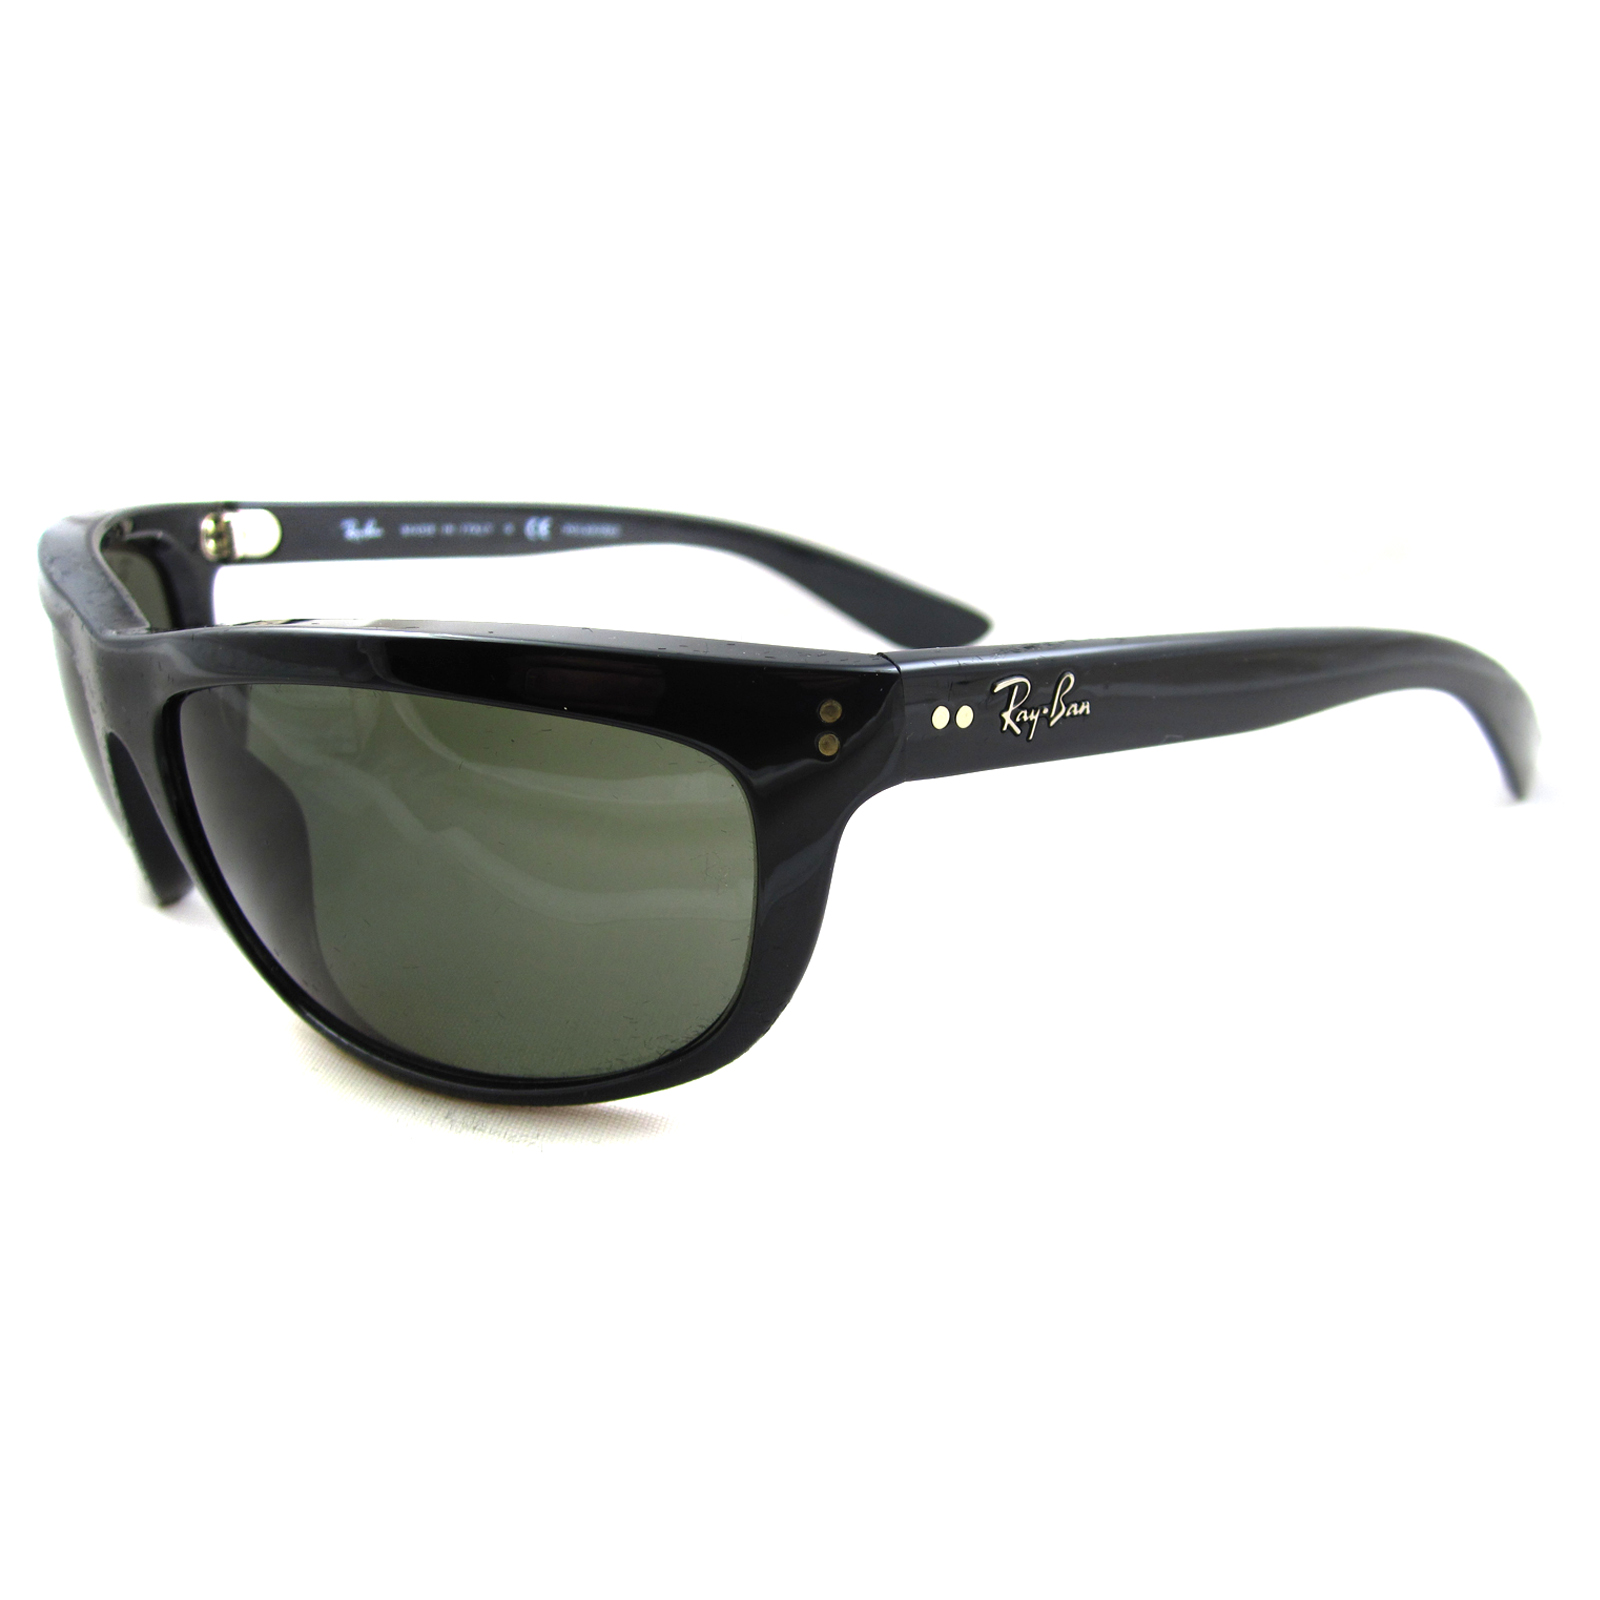 Cheap Ray Ban Balorama 4089 Sunglasses Discounted Sunglasses